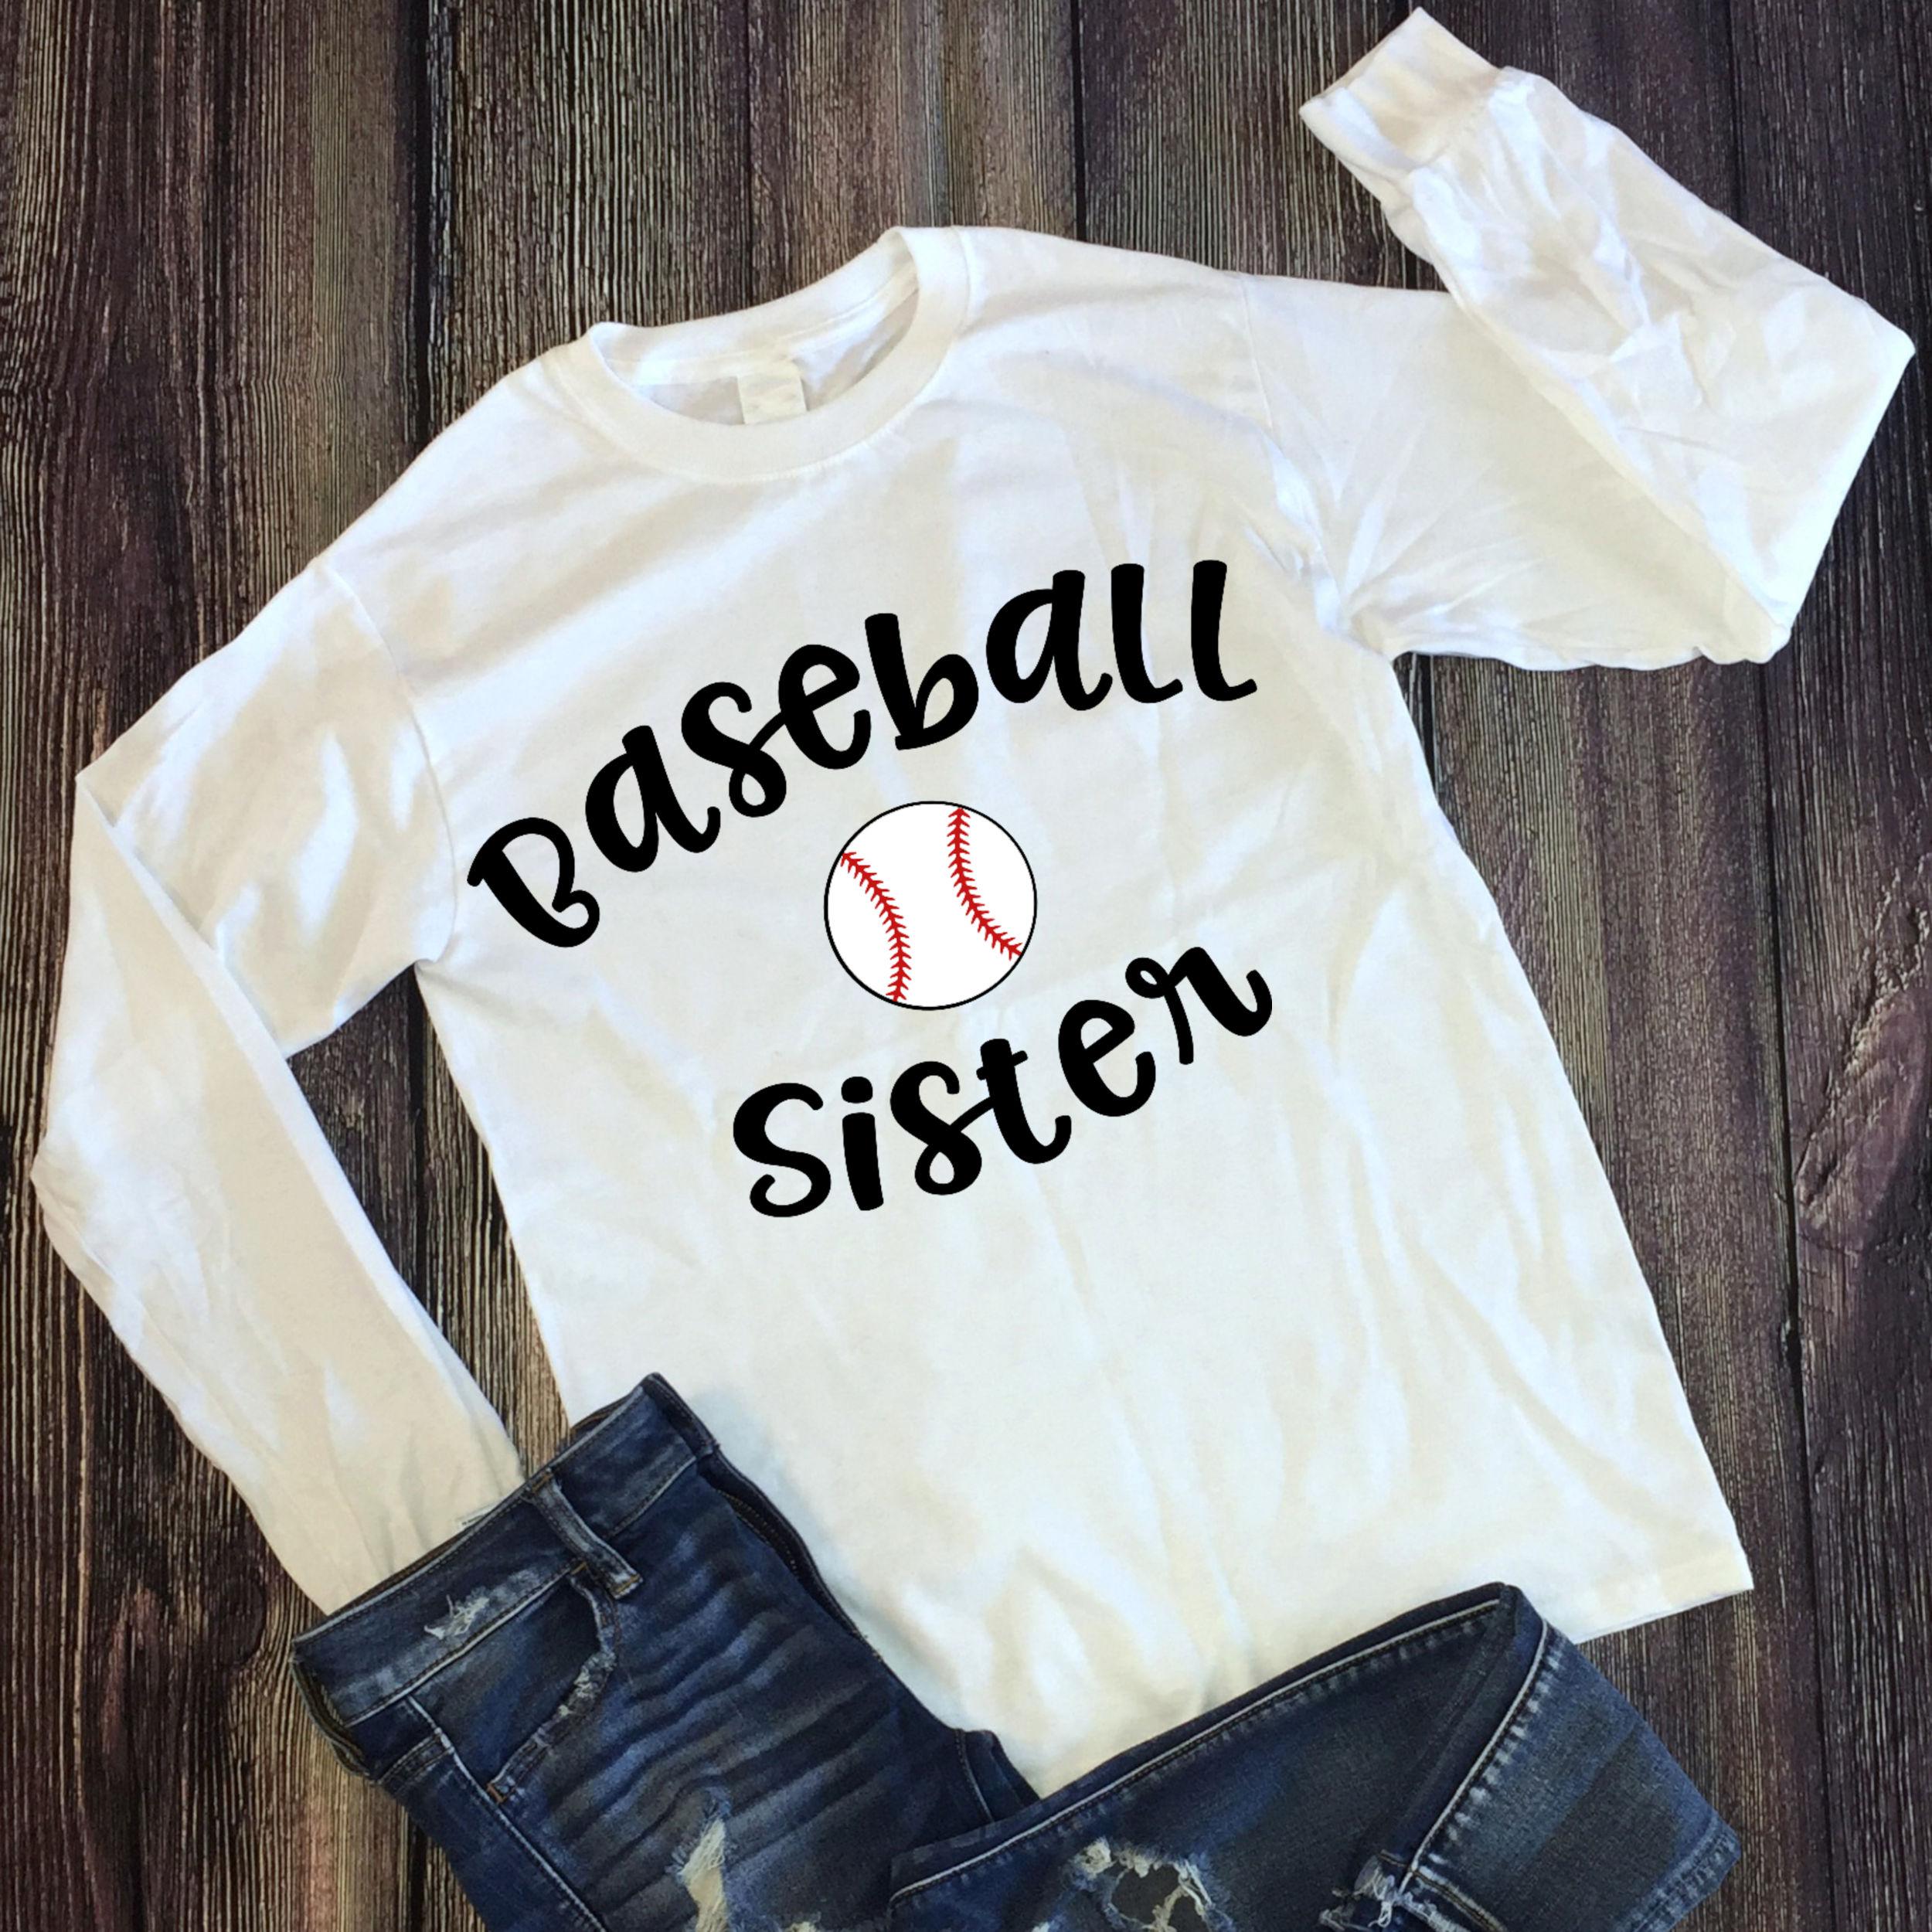 Baseball SVG Bundle - Includes 12 Baseball Designs example image 13